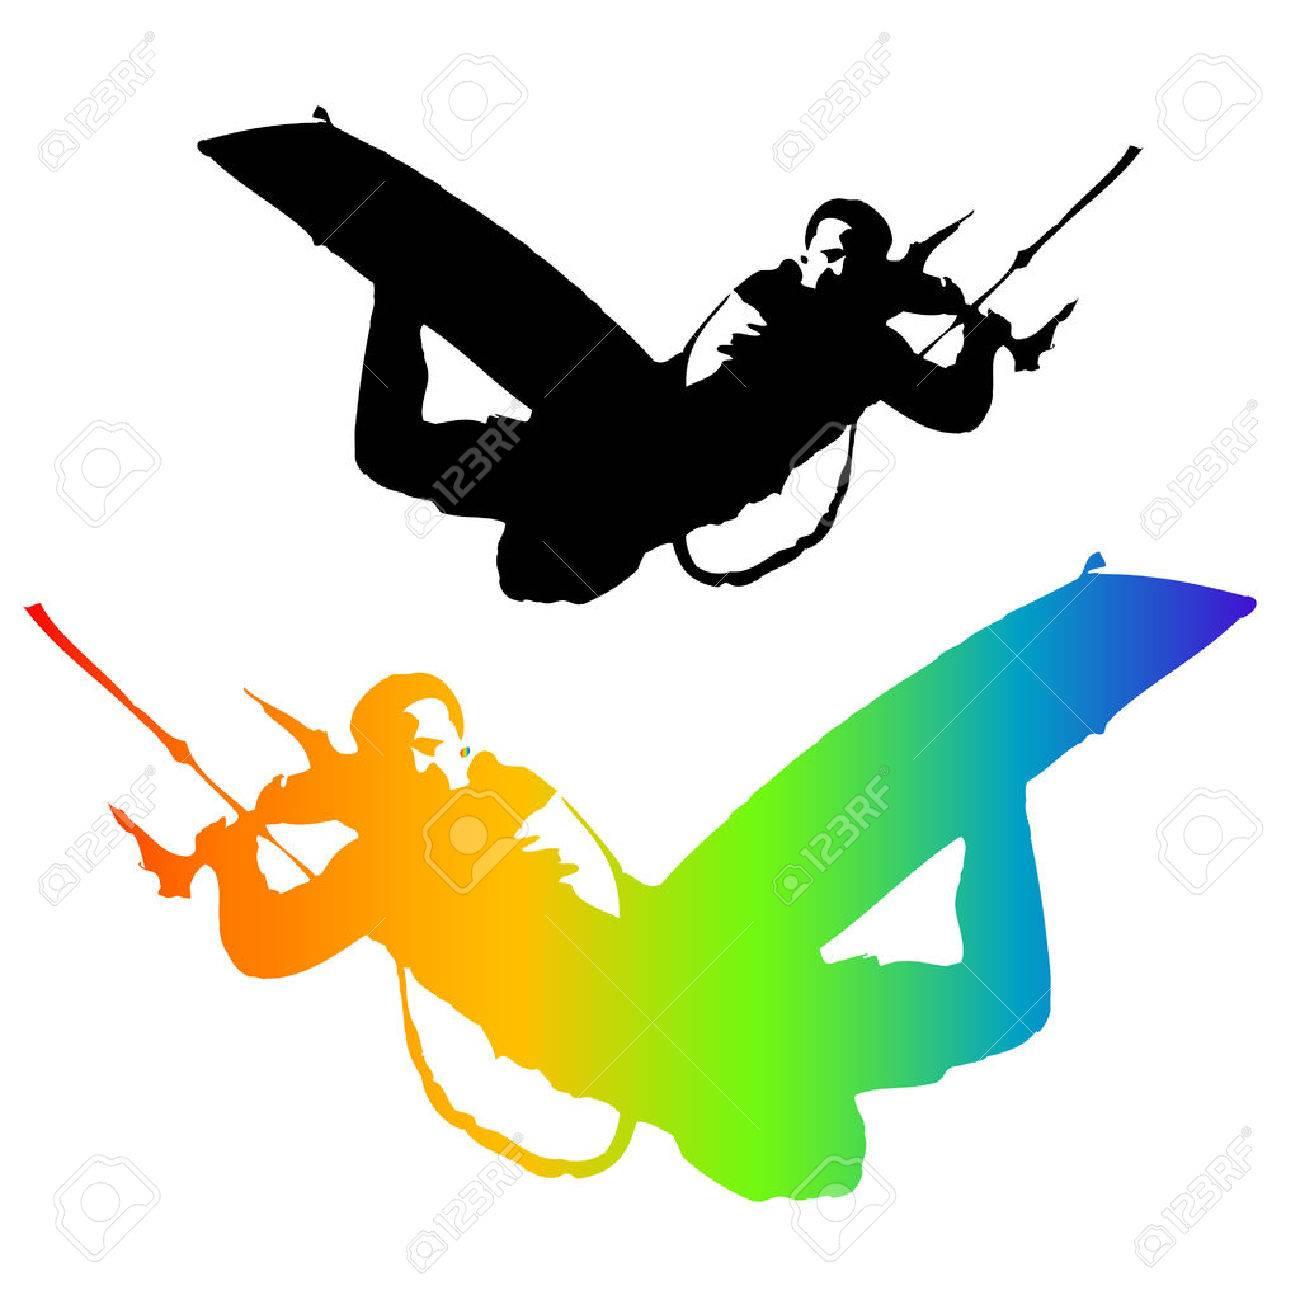 Kite Rider isolated on white background. Illustration. Vector . Standard-Bild - 31289483